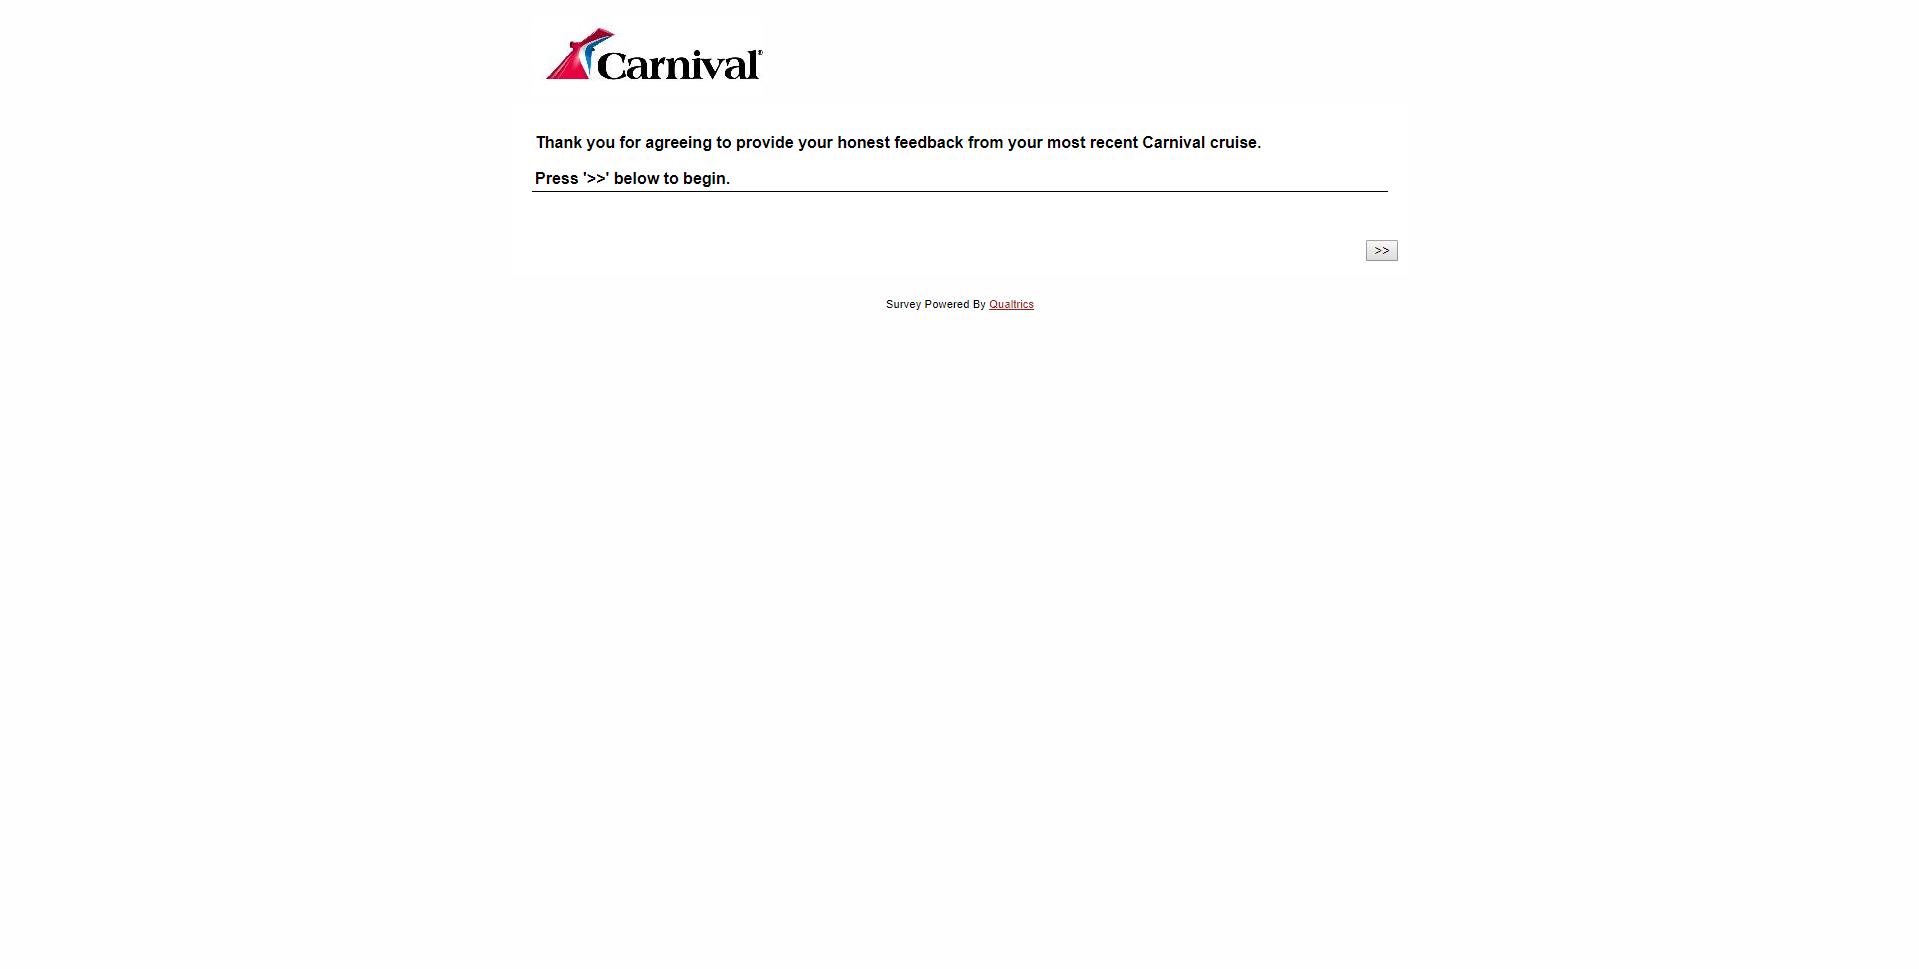 carnivalwebfeedback.qualtrics.com/jfe/form/SV_3gWEjcA8nhUATAM